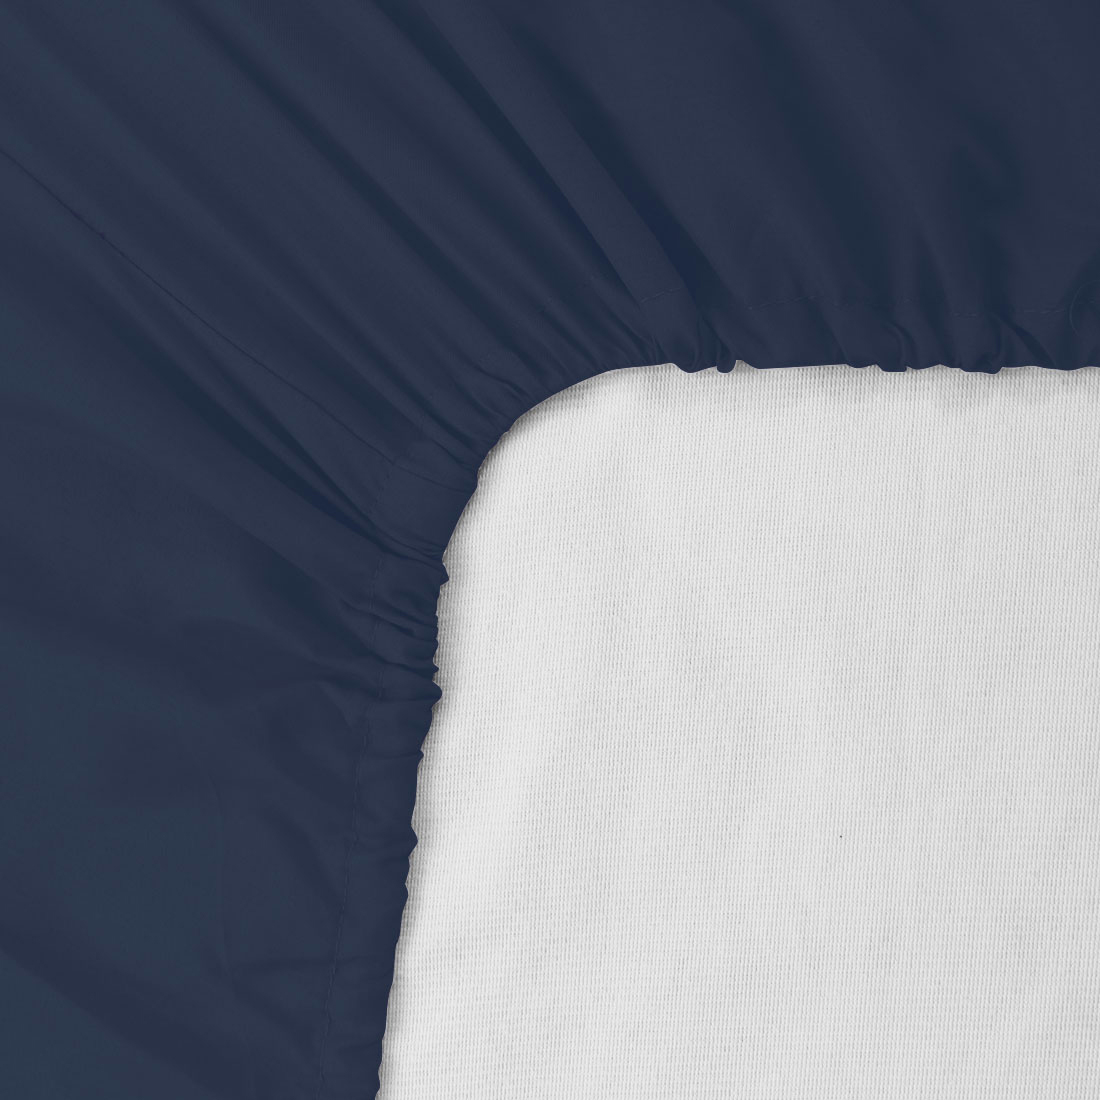 deep pocket fitted sheets queen only microfiber sheet set navy blue. Black Bedroom Furniture Sets. Home Design Ideas